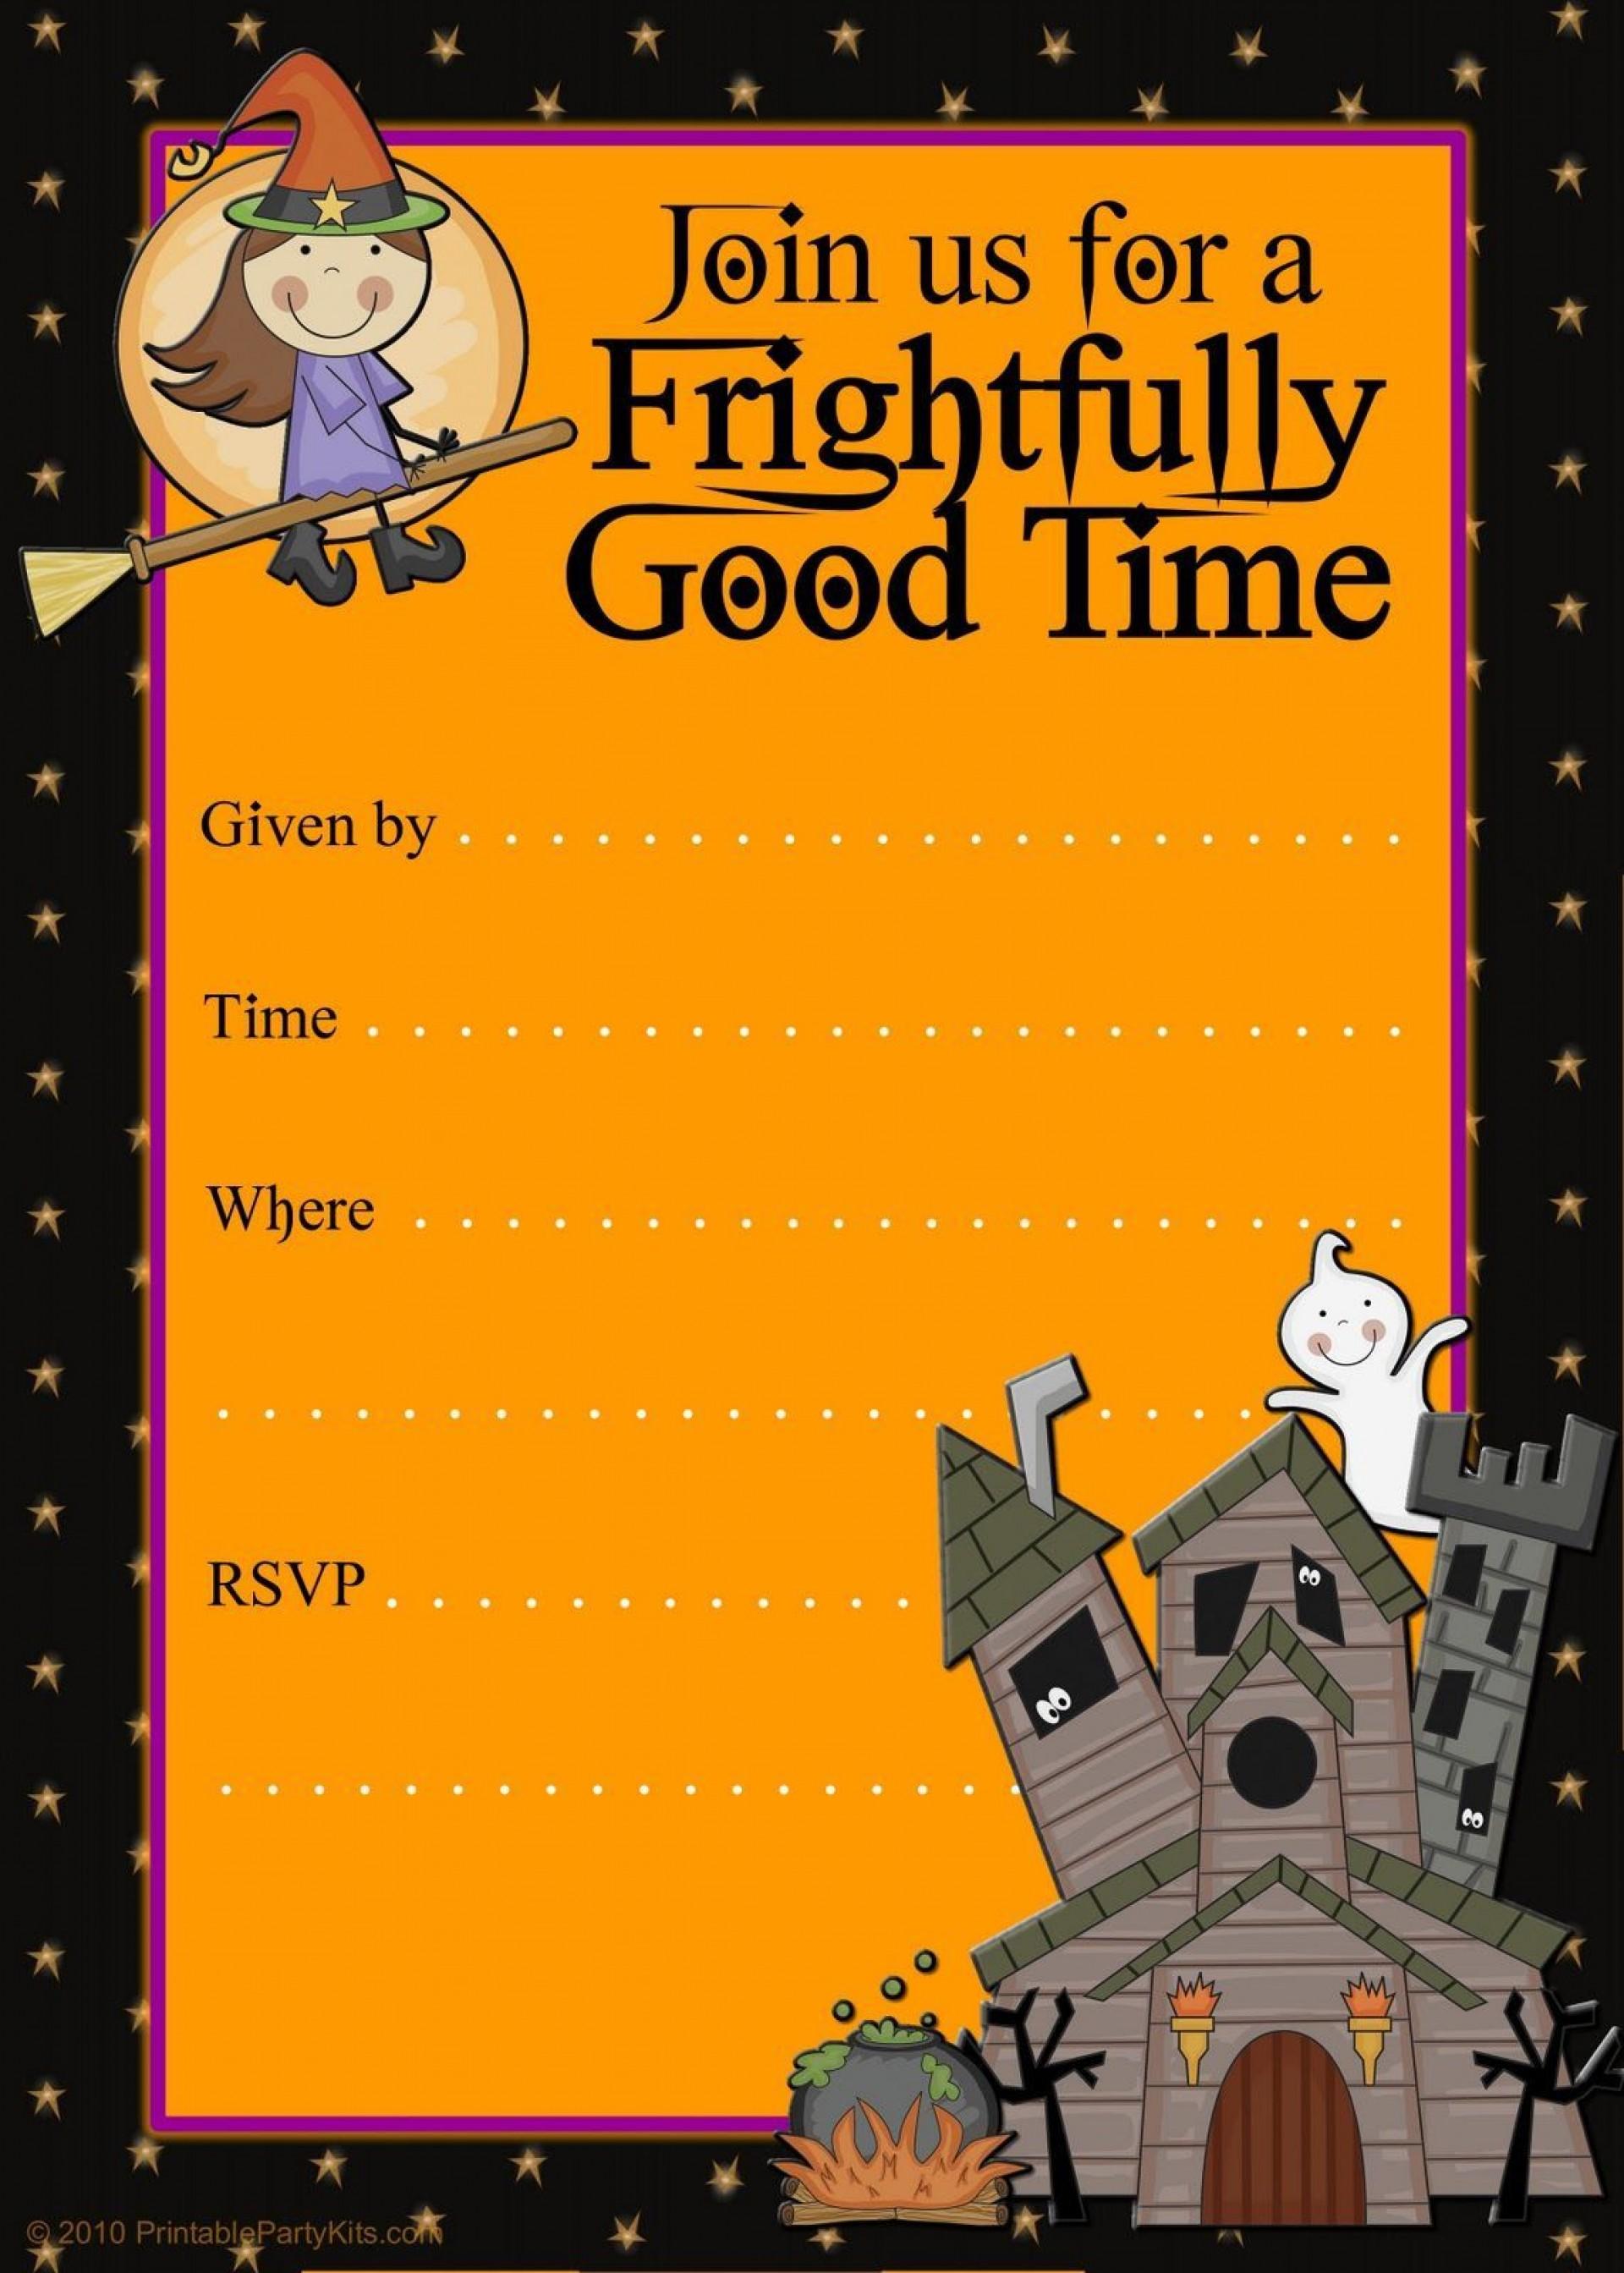 000 Surprising Halloween Party Invite Template Design  Templates - Free Printable Spooky Invitation Birthday1920